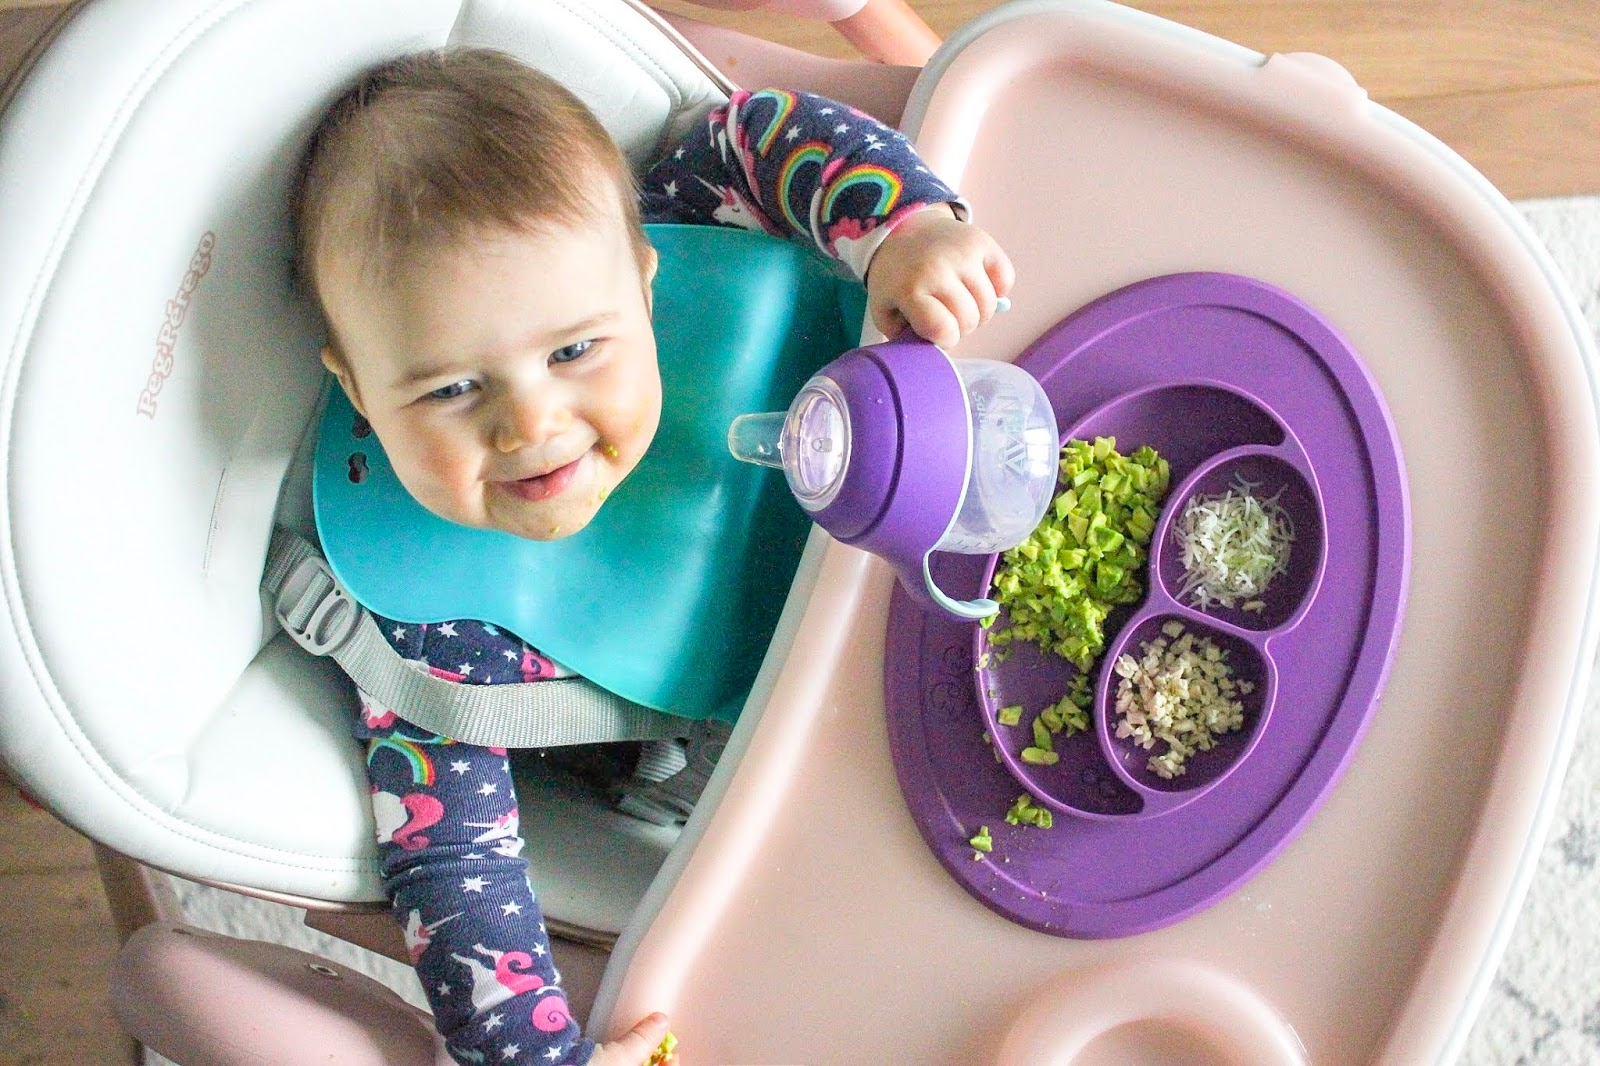 baby in Peg Perego highchair